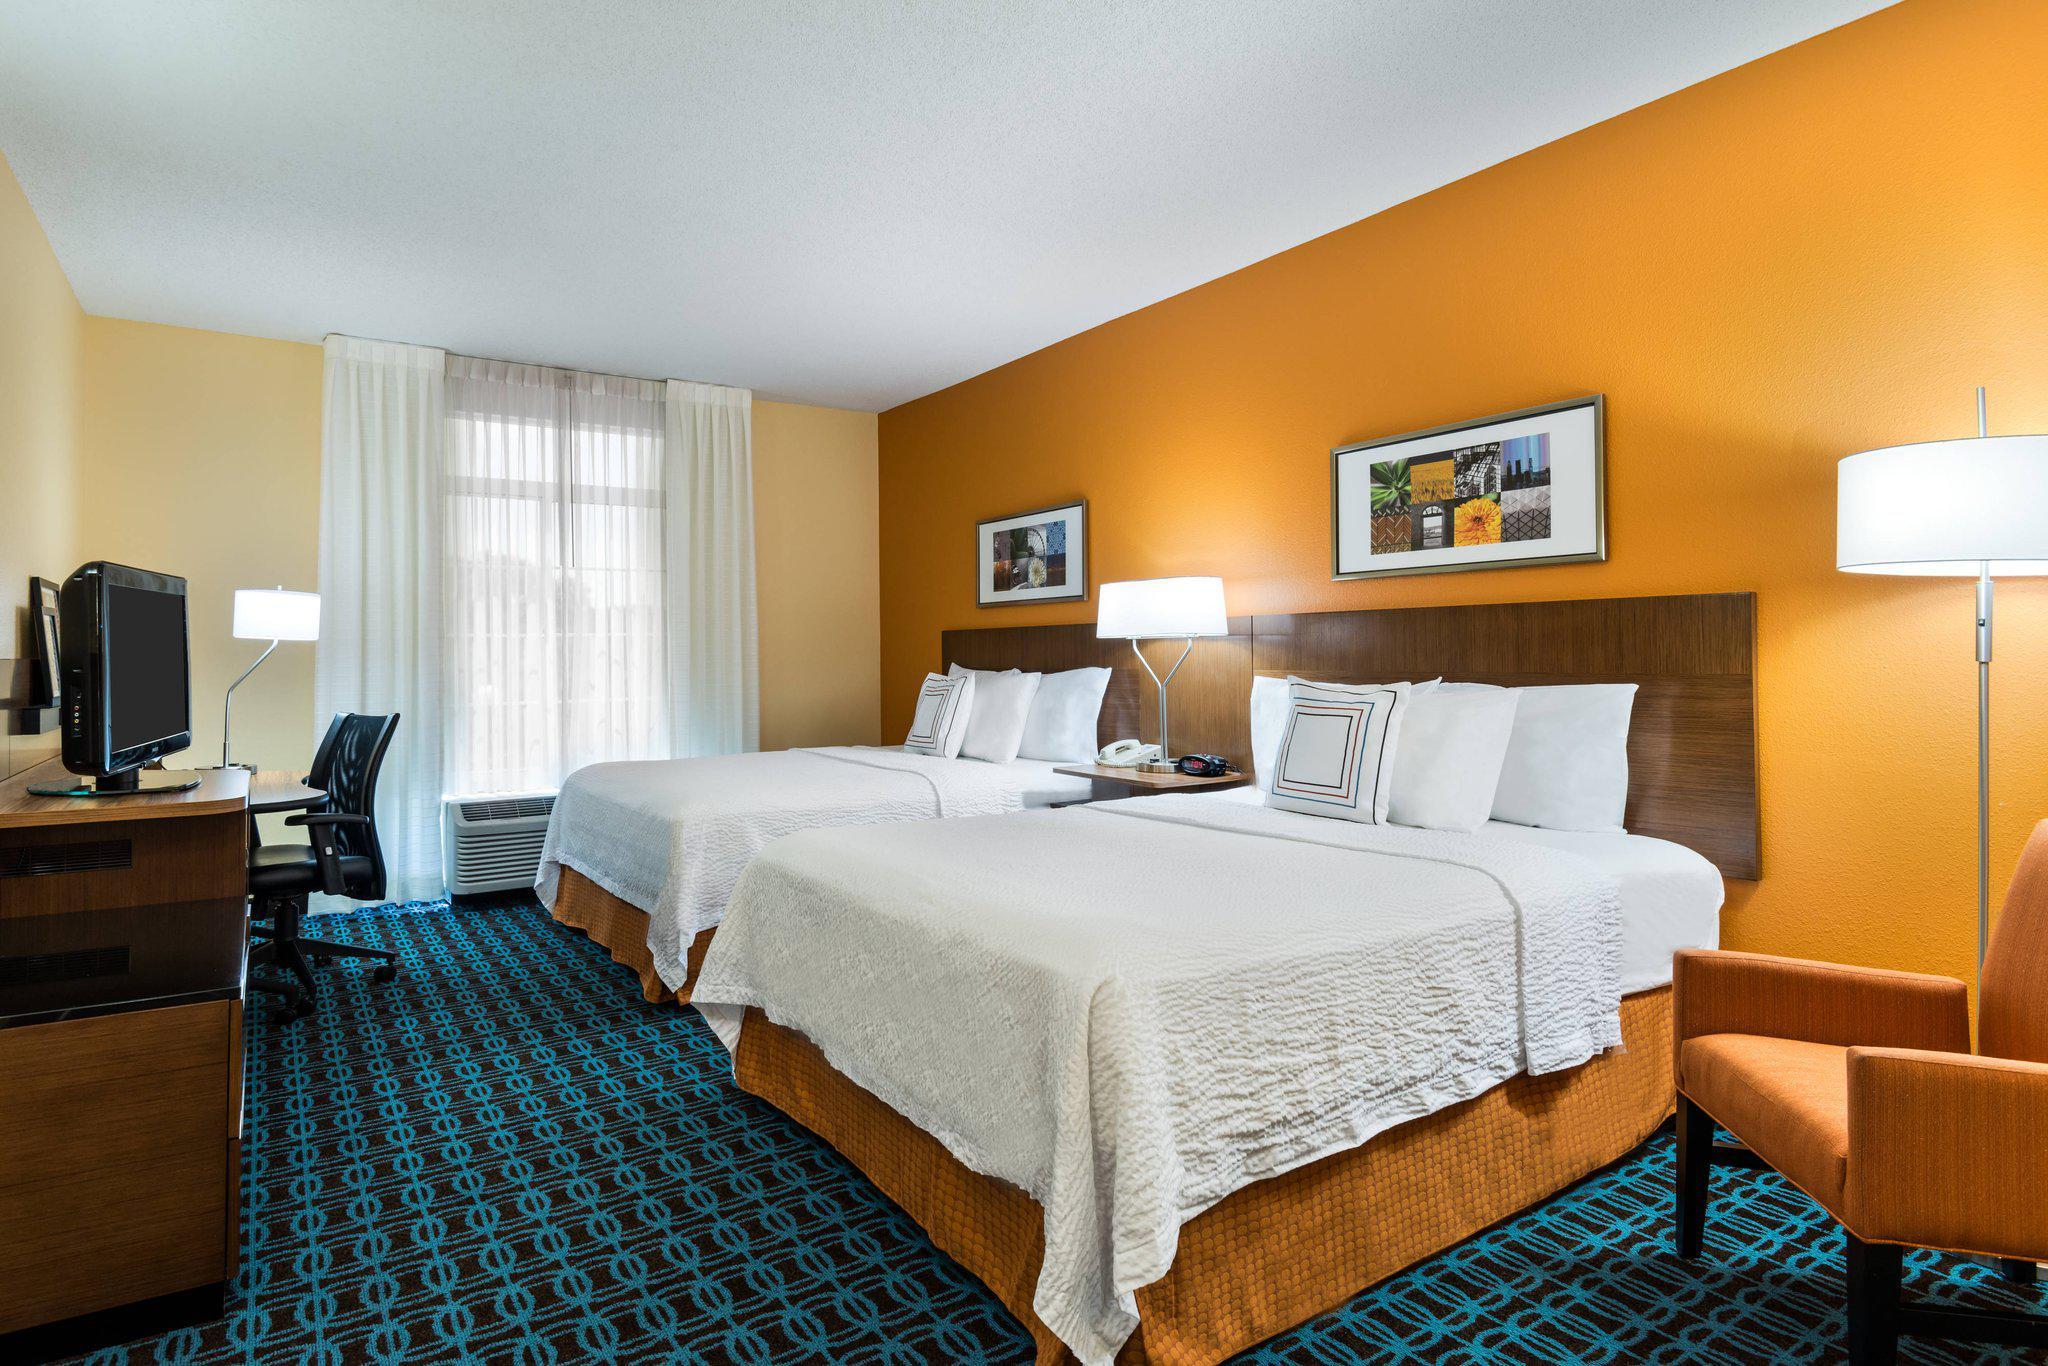 Fairfield Inn & Suites by Marriott Clearwater in Clearwater, FL, photo #7